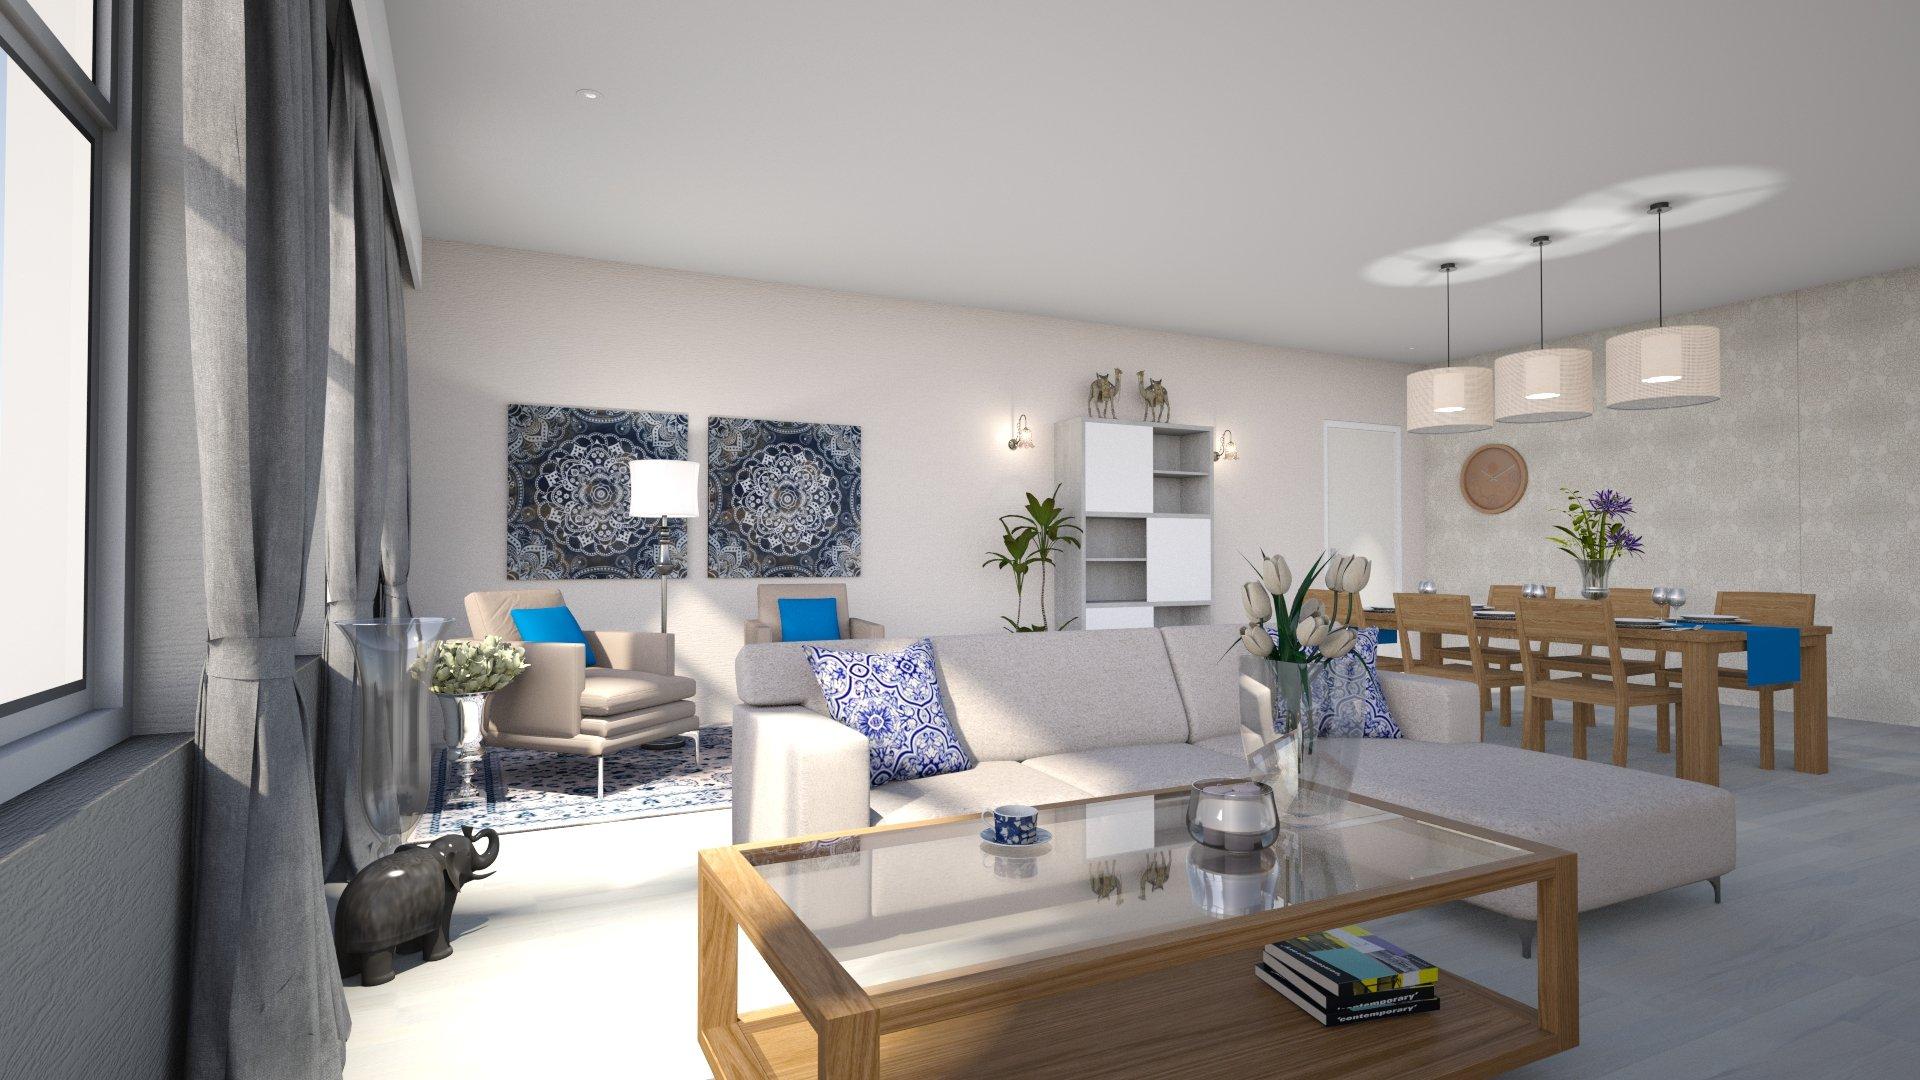 3D render floorplanner